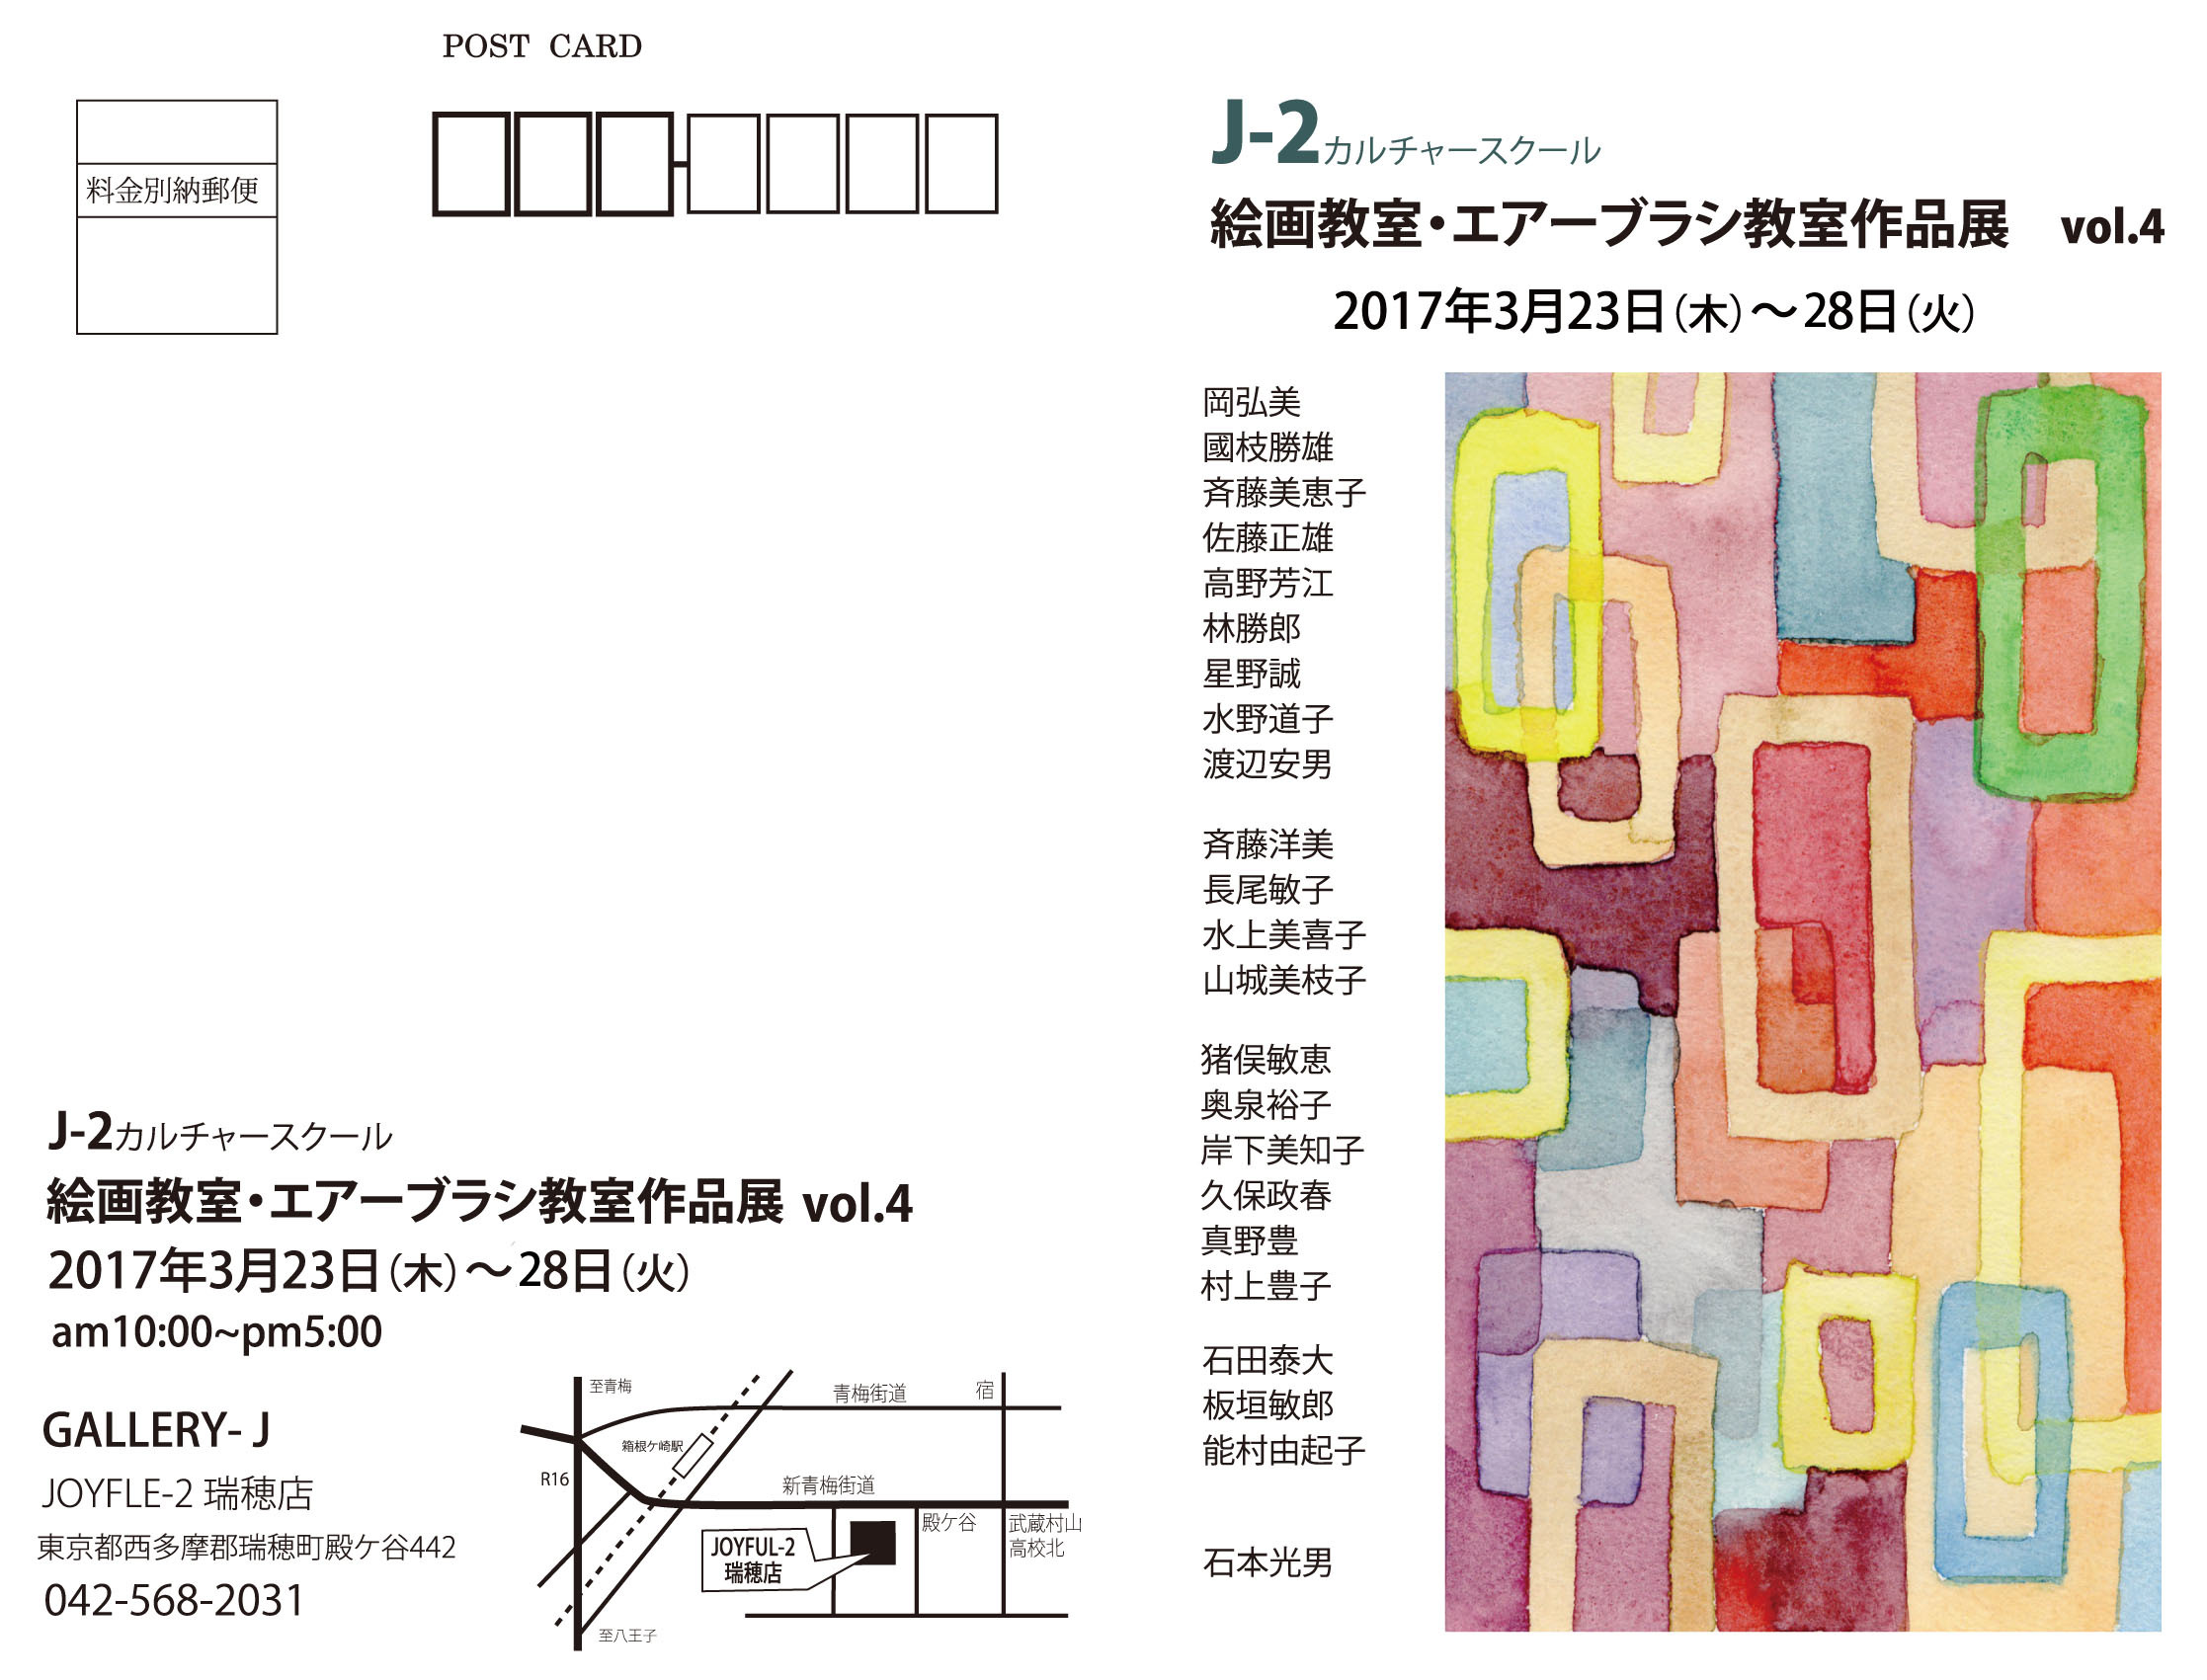 J−2瑞穂店のカルチャースクール絵画教室とエアーブラシ教室展 vol.4のおしらせです。_b0129807_17424503.jpg